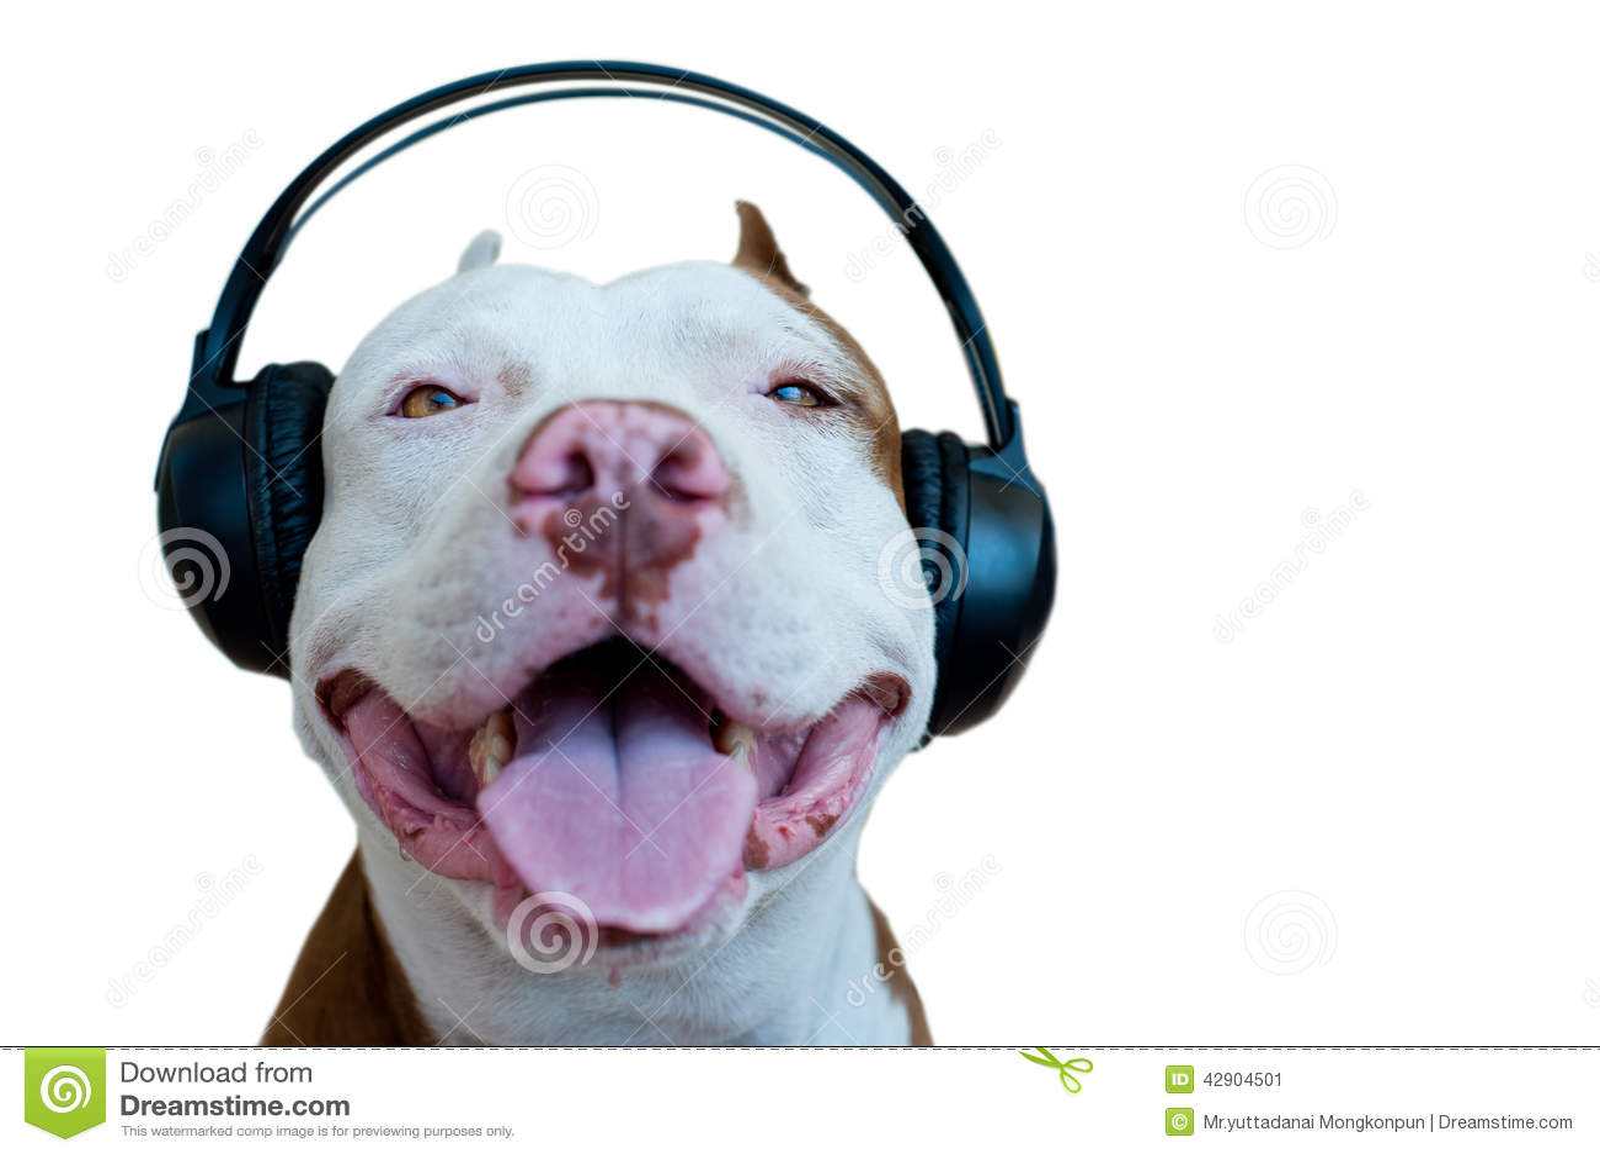 Pitbull With Headphone Stock Image Image Of Headphones